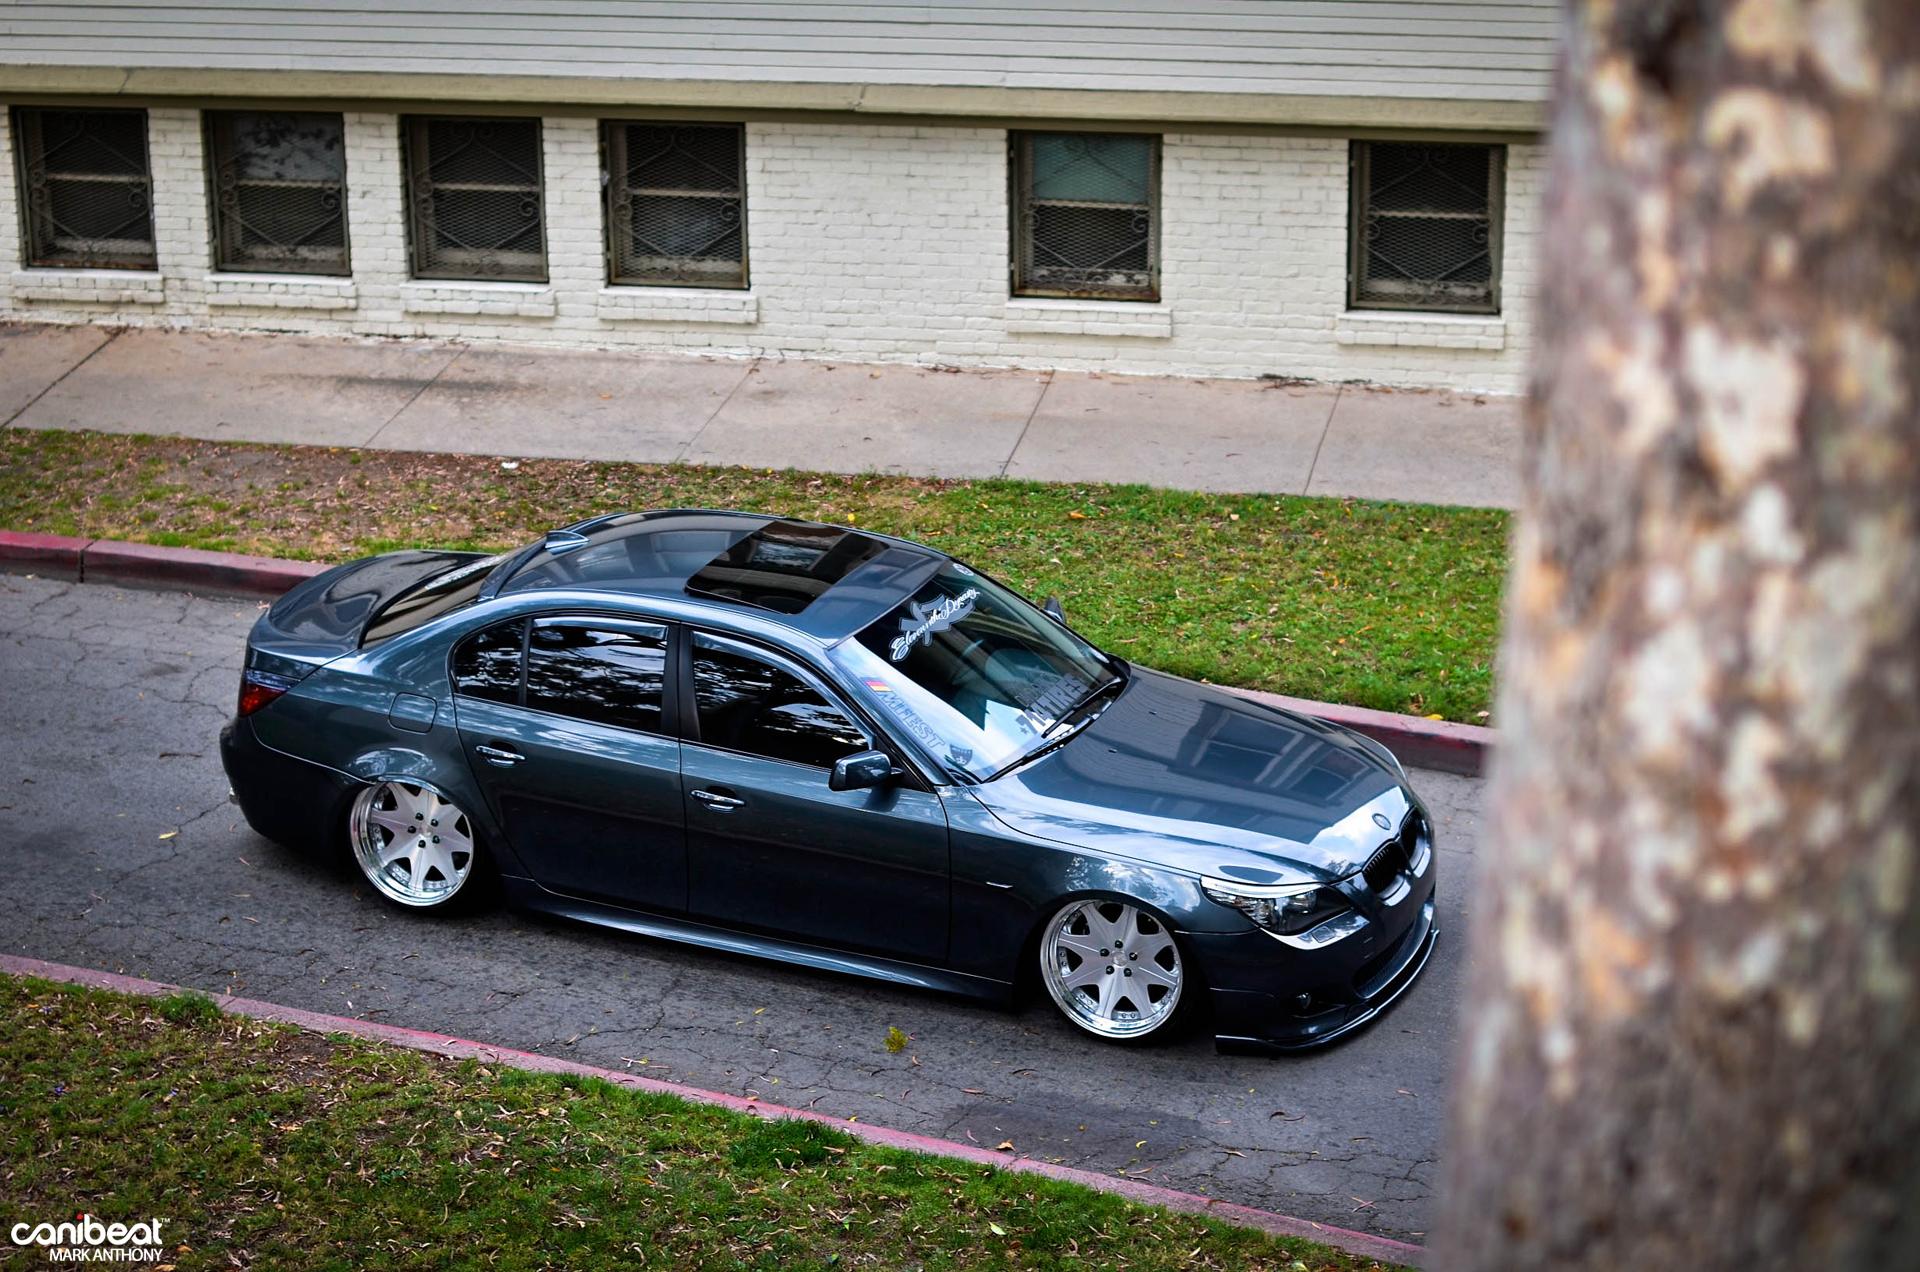 Bmw E60 528i Strolls Through La With Style Autoevolution